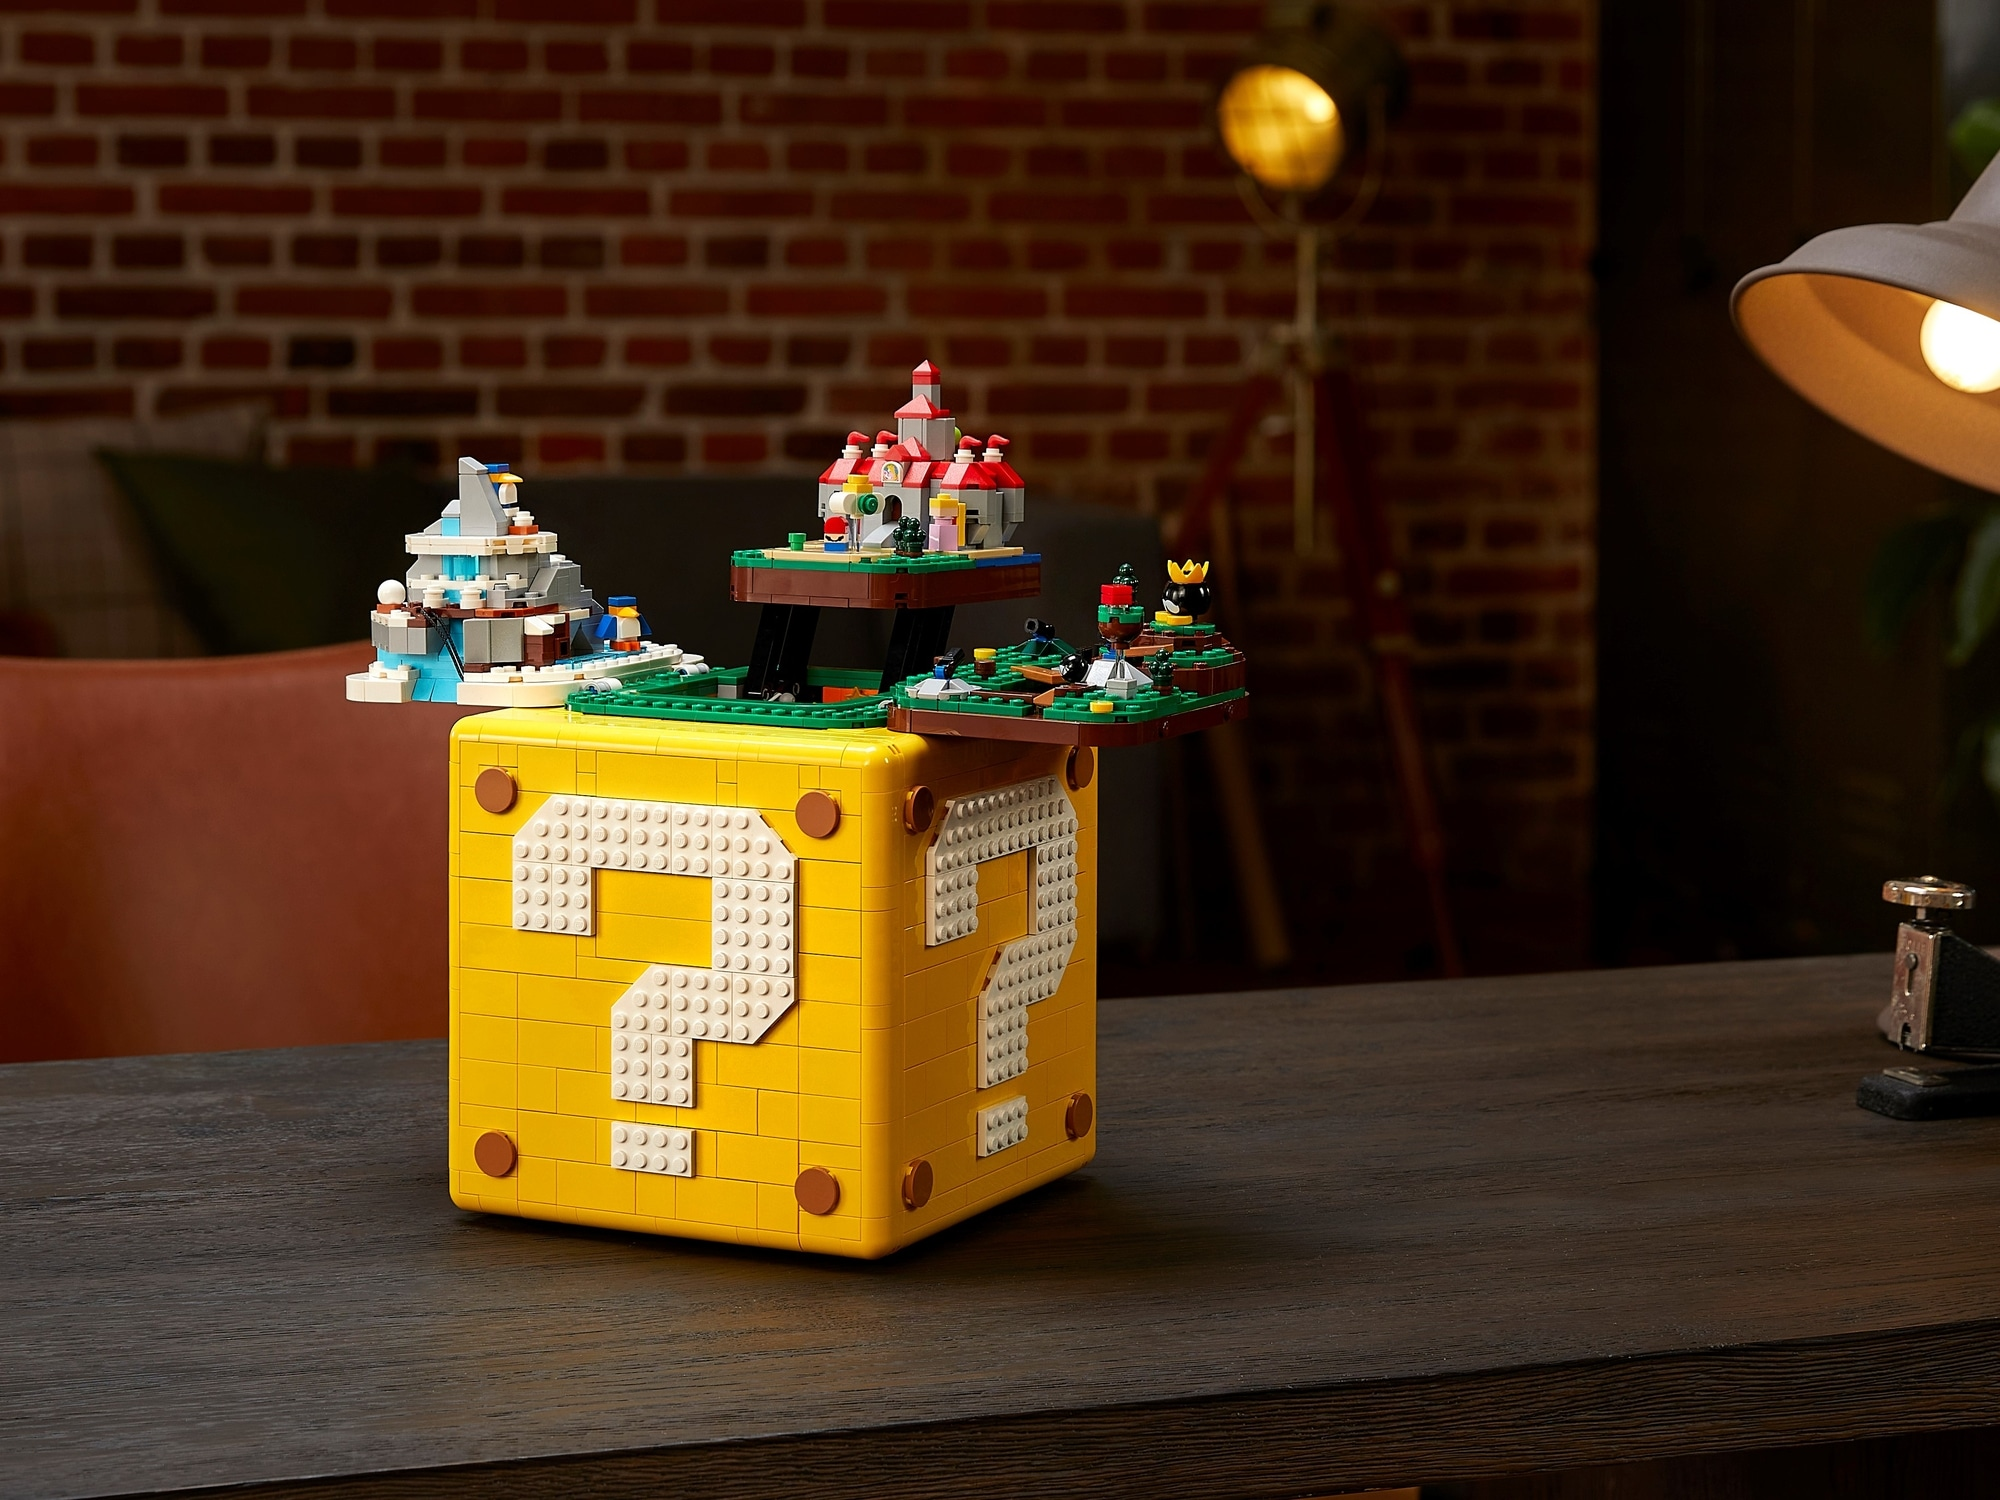 Super Mario 64: the Nintendo classic gets a Lego set!